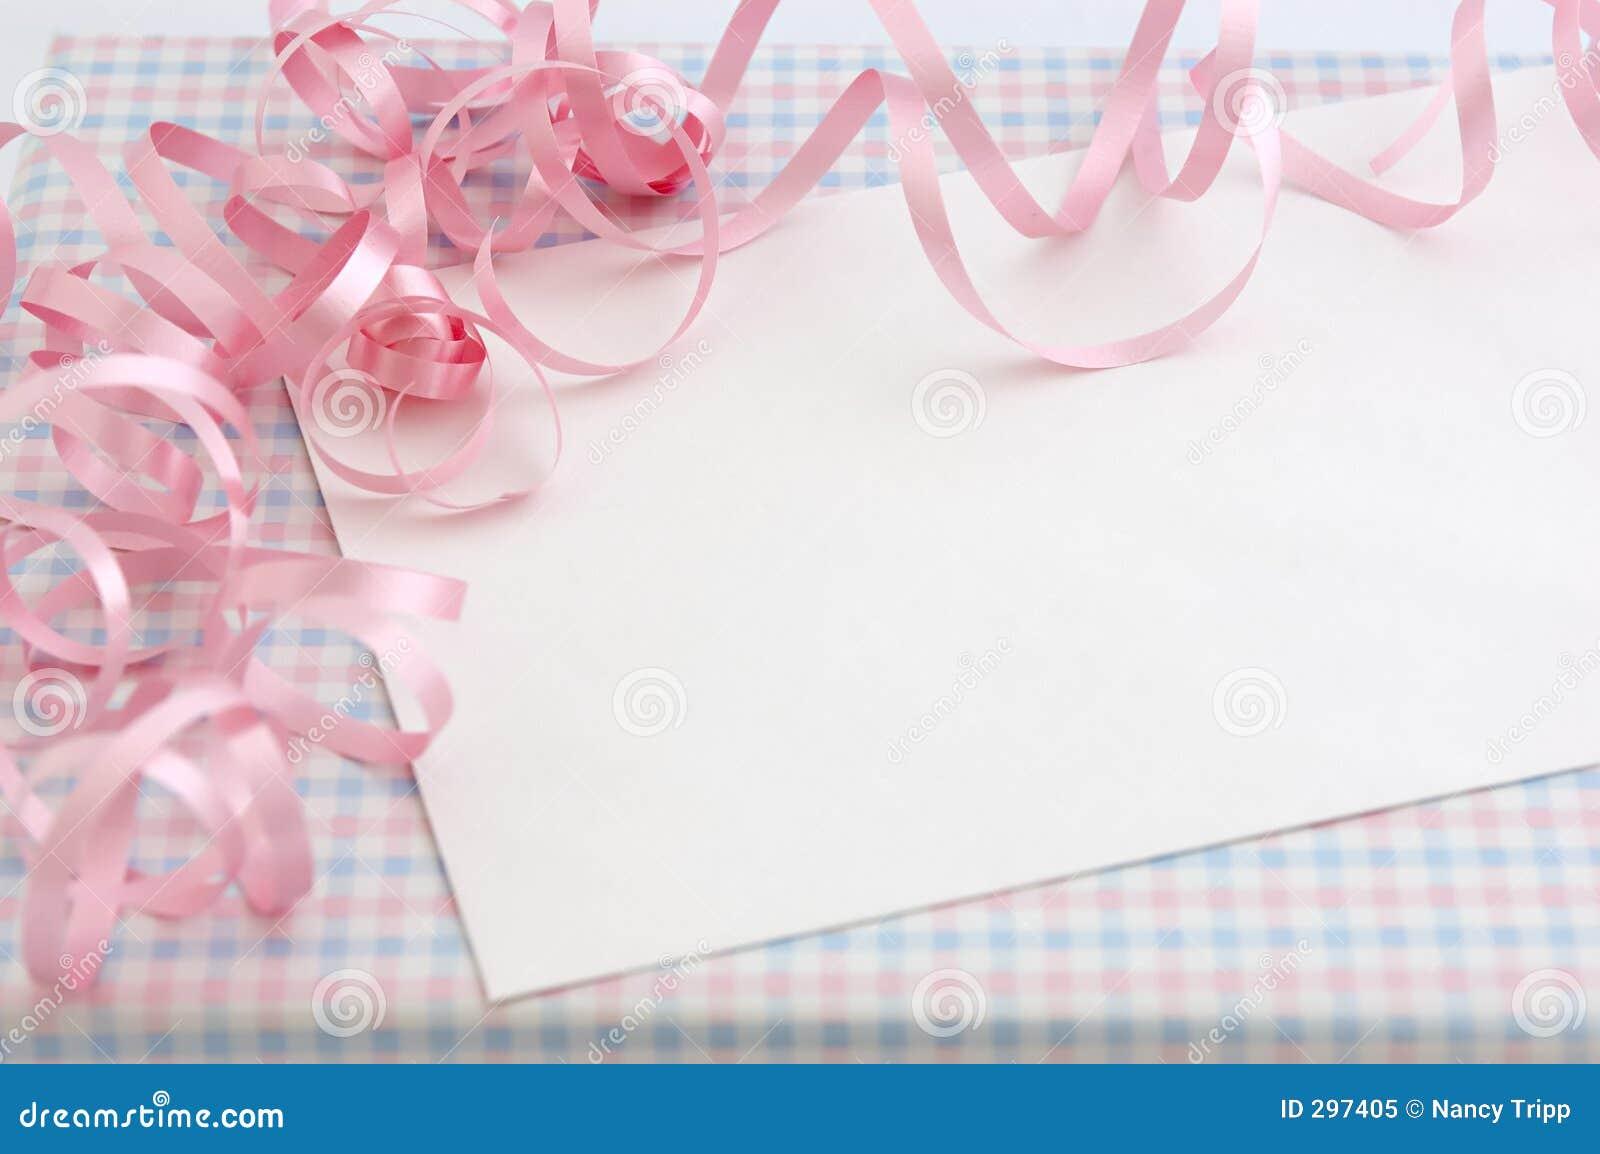 Gift for baby girl